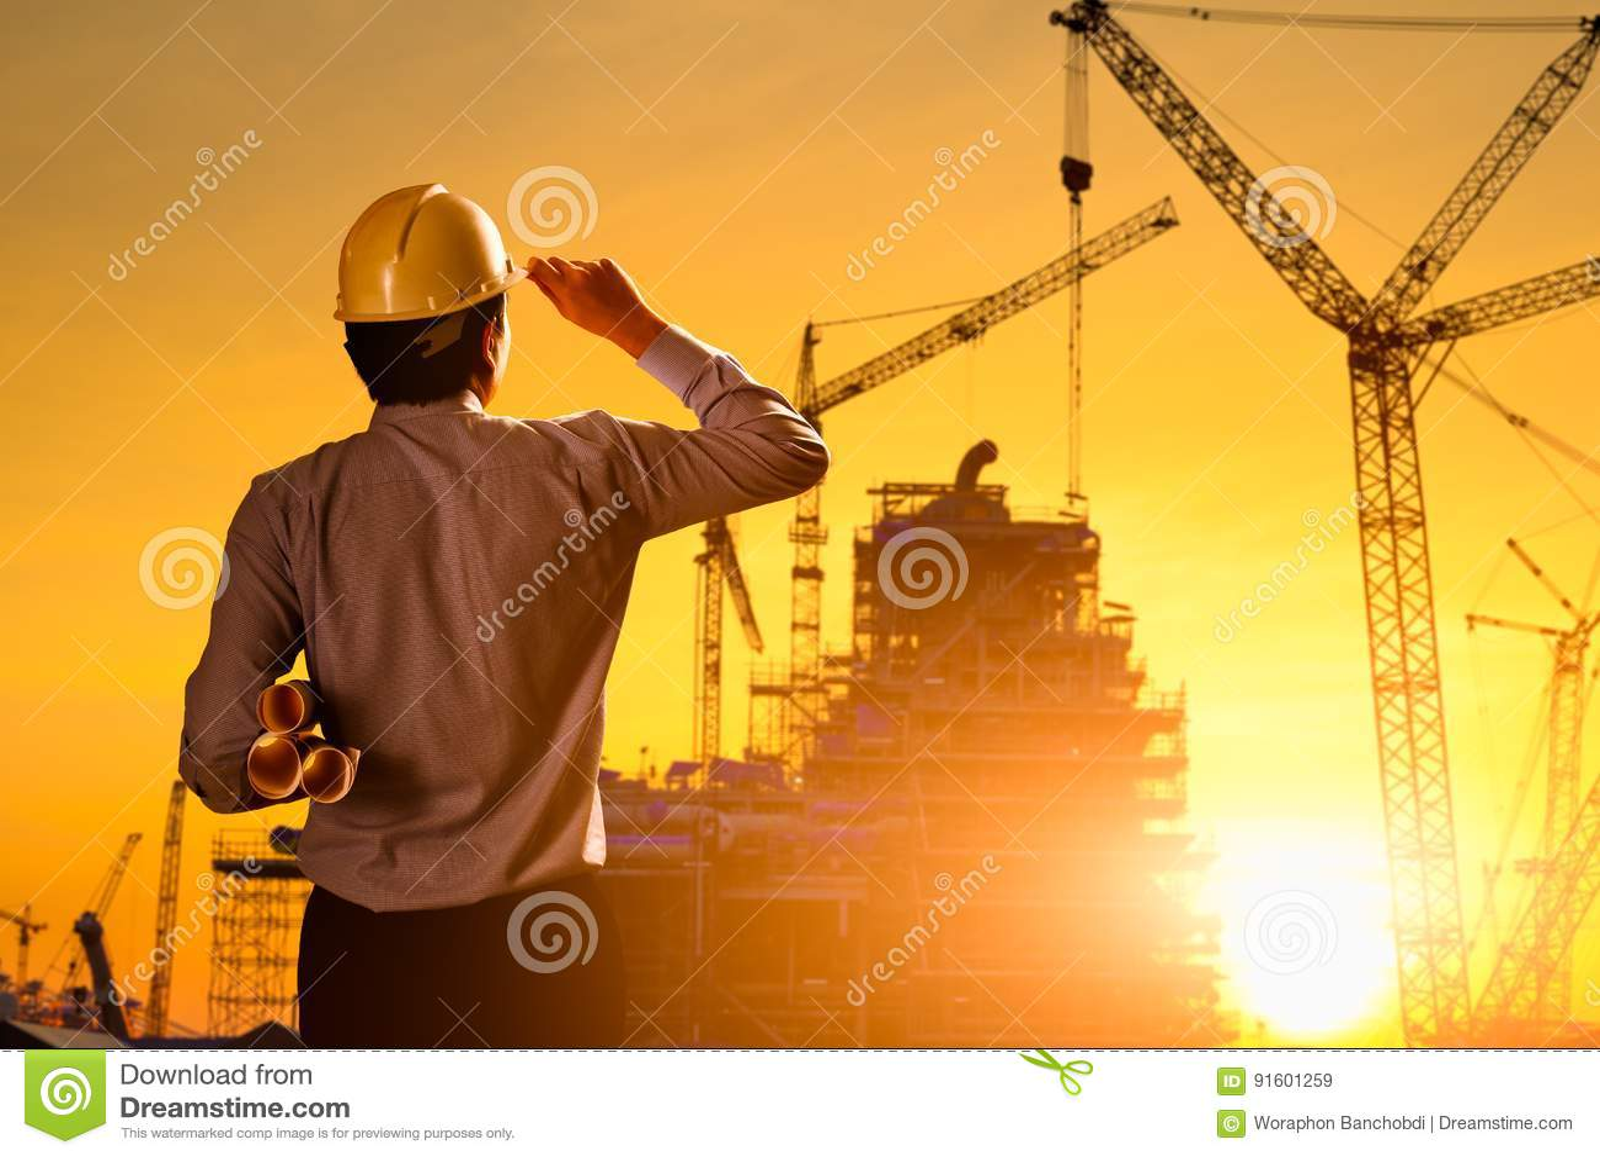 Silhouette engineer